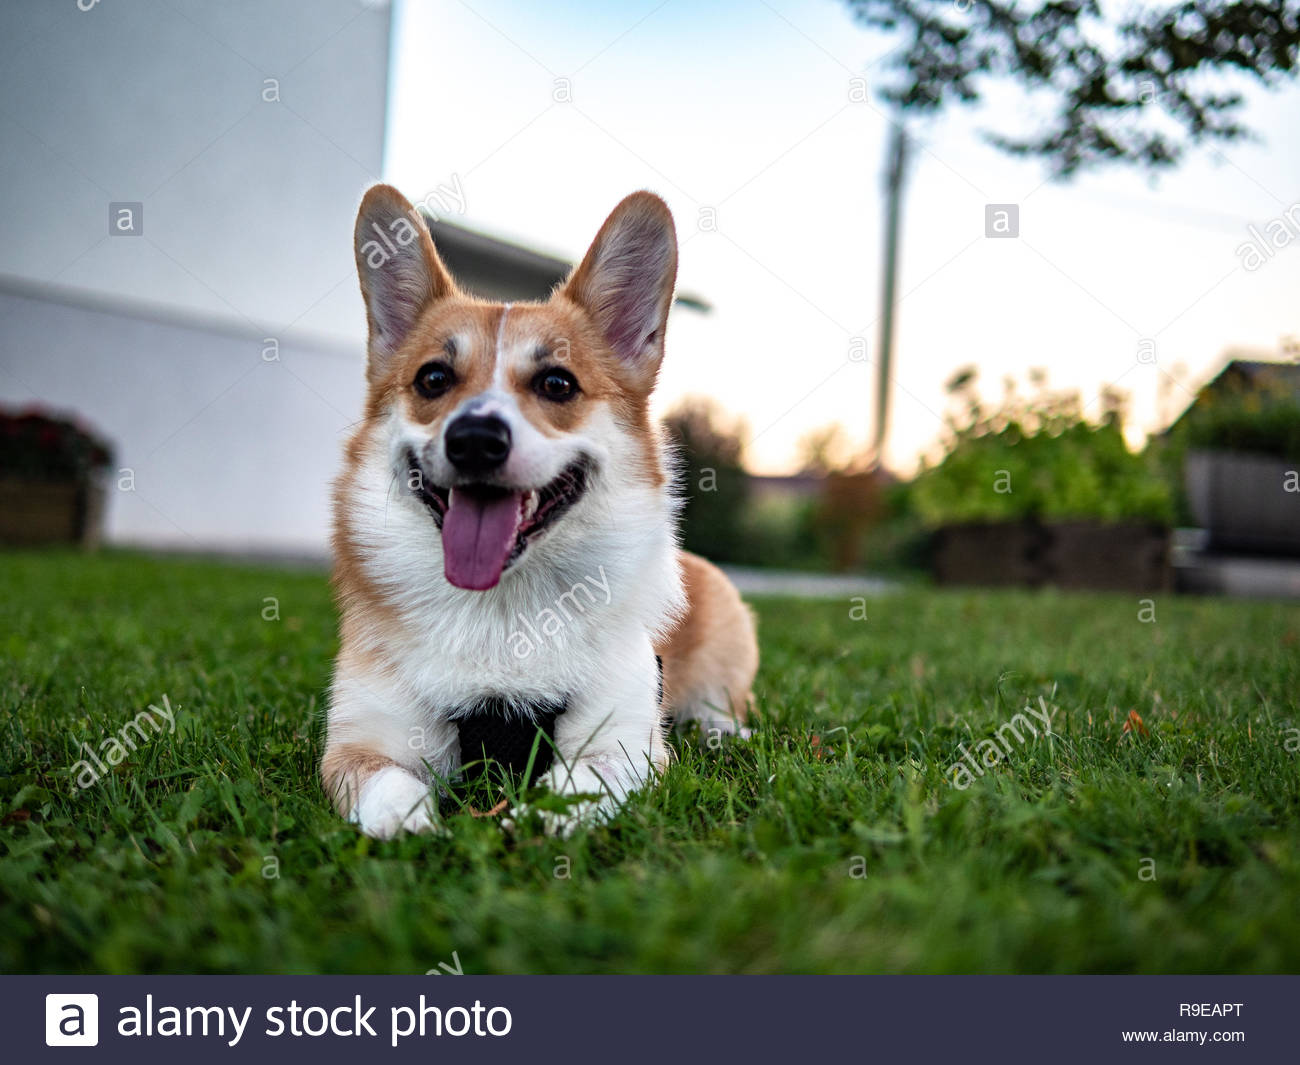 Portrait of young smiling dog welsh corgi pembroke posing outside in a park - Stock Image